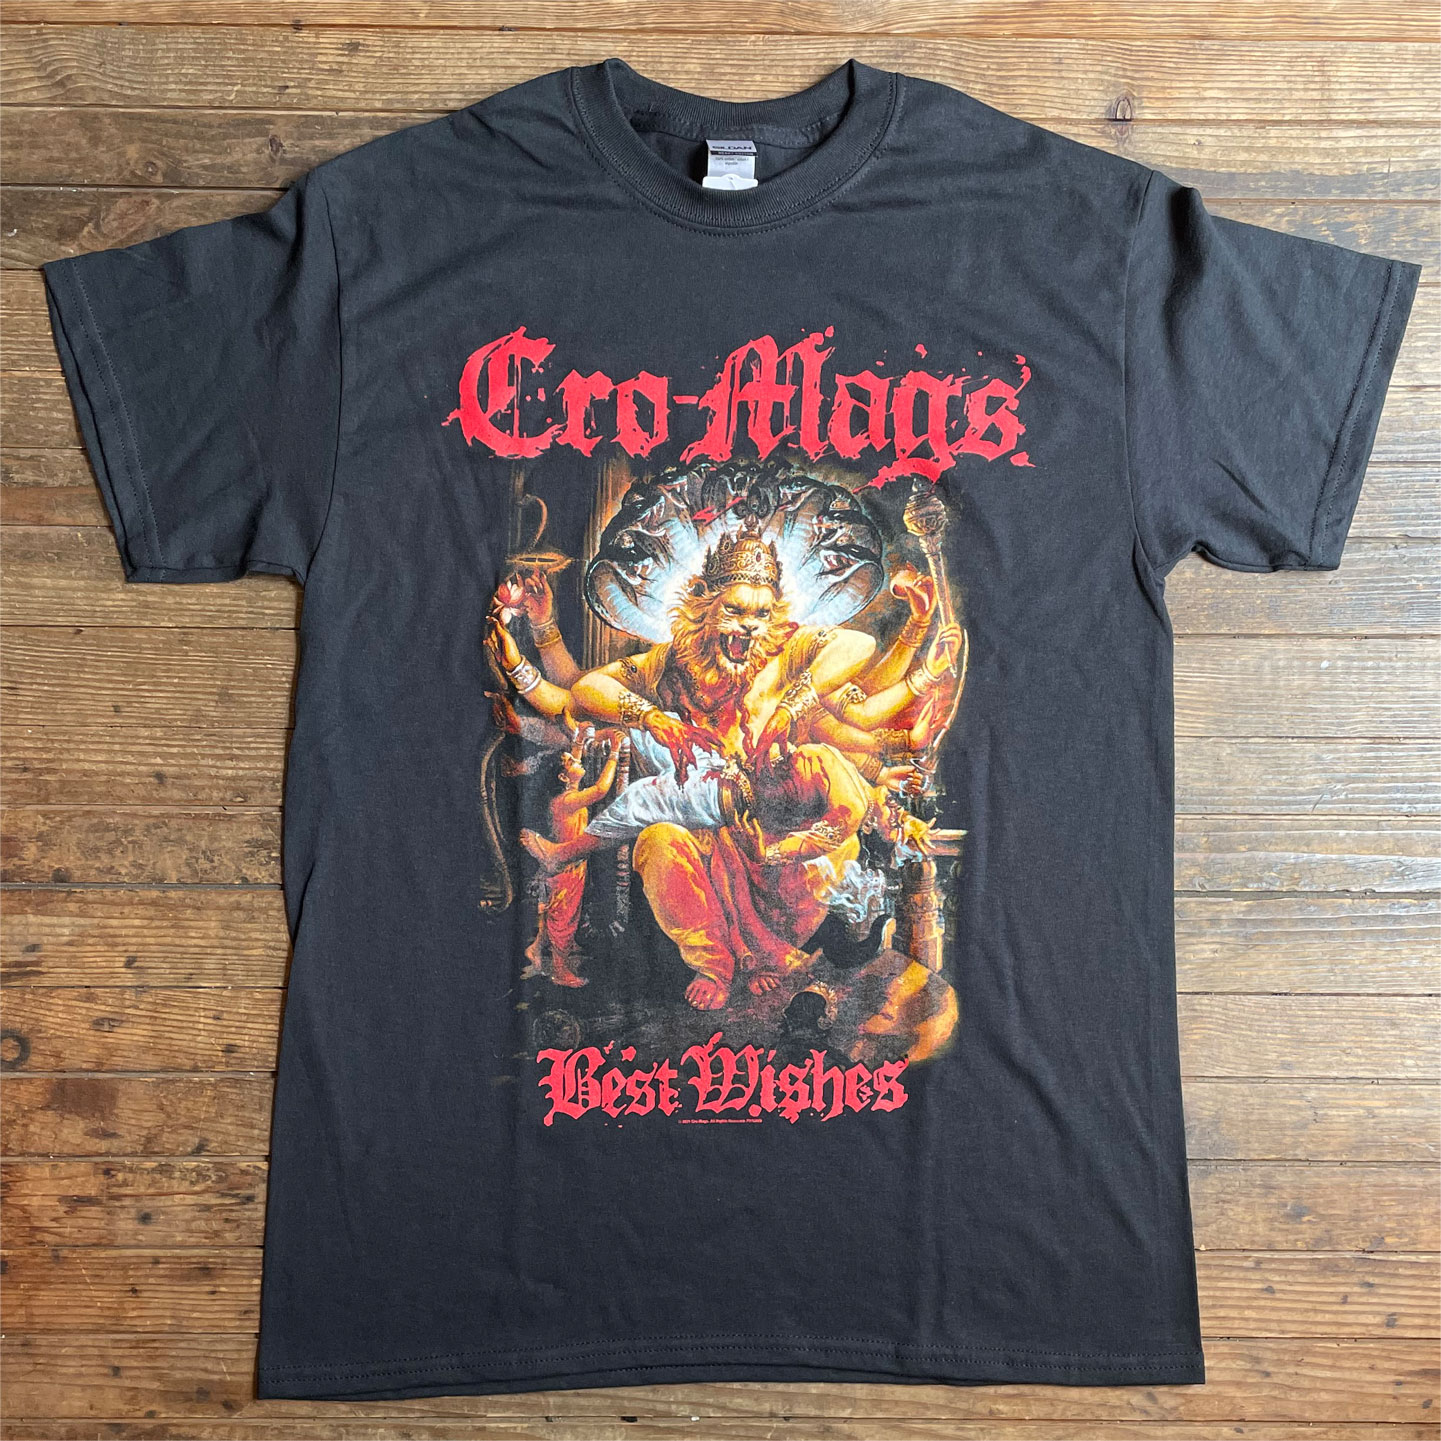 CRO-MAGS Tシャツ BEST WISHES オフィシャル